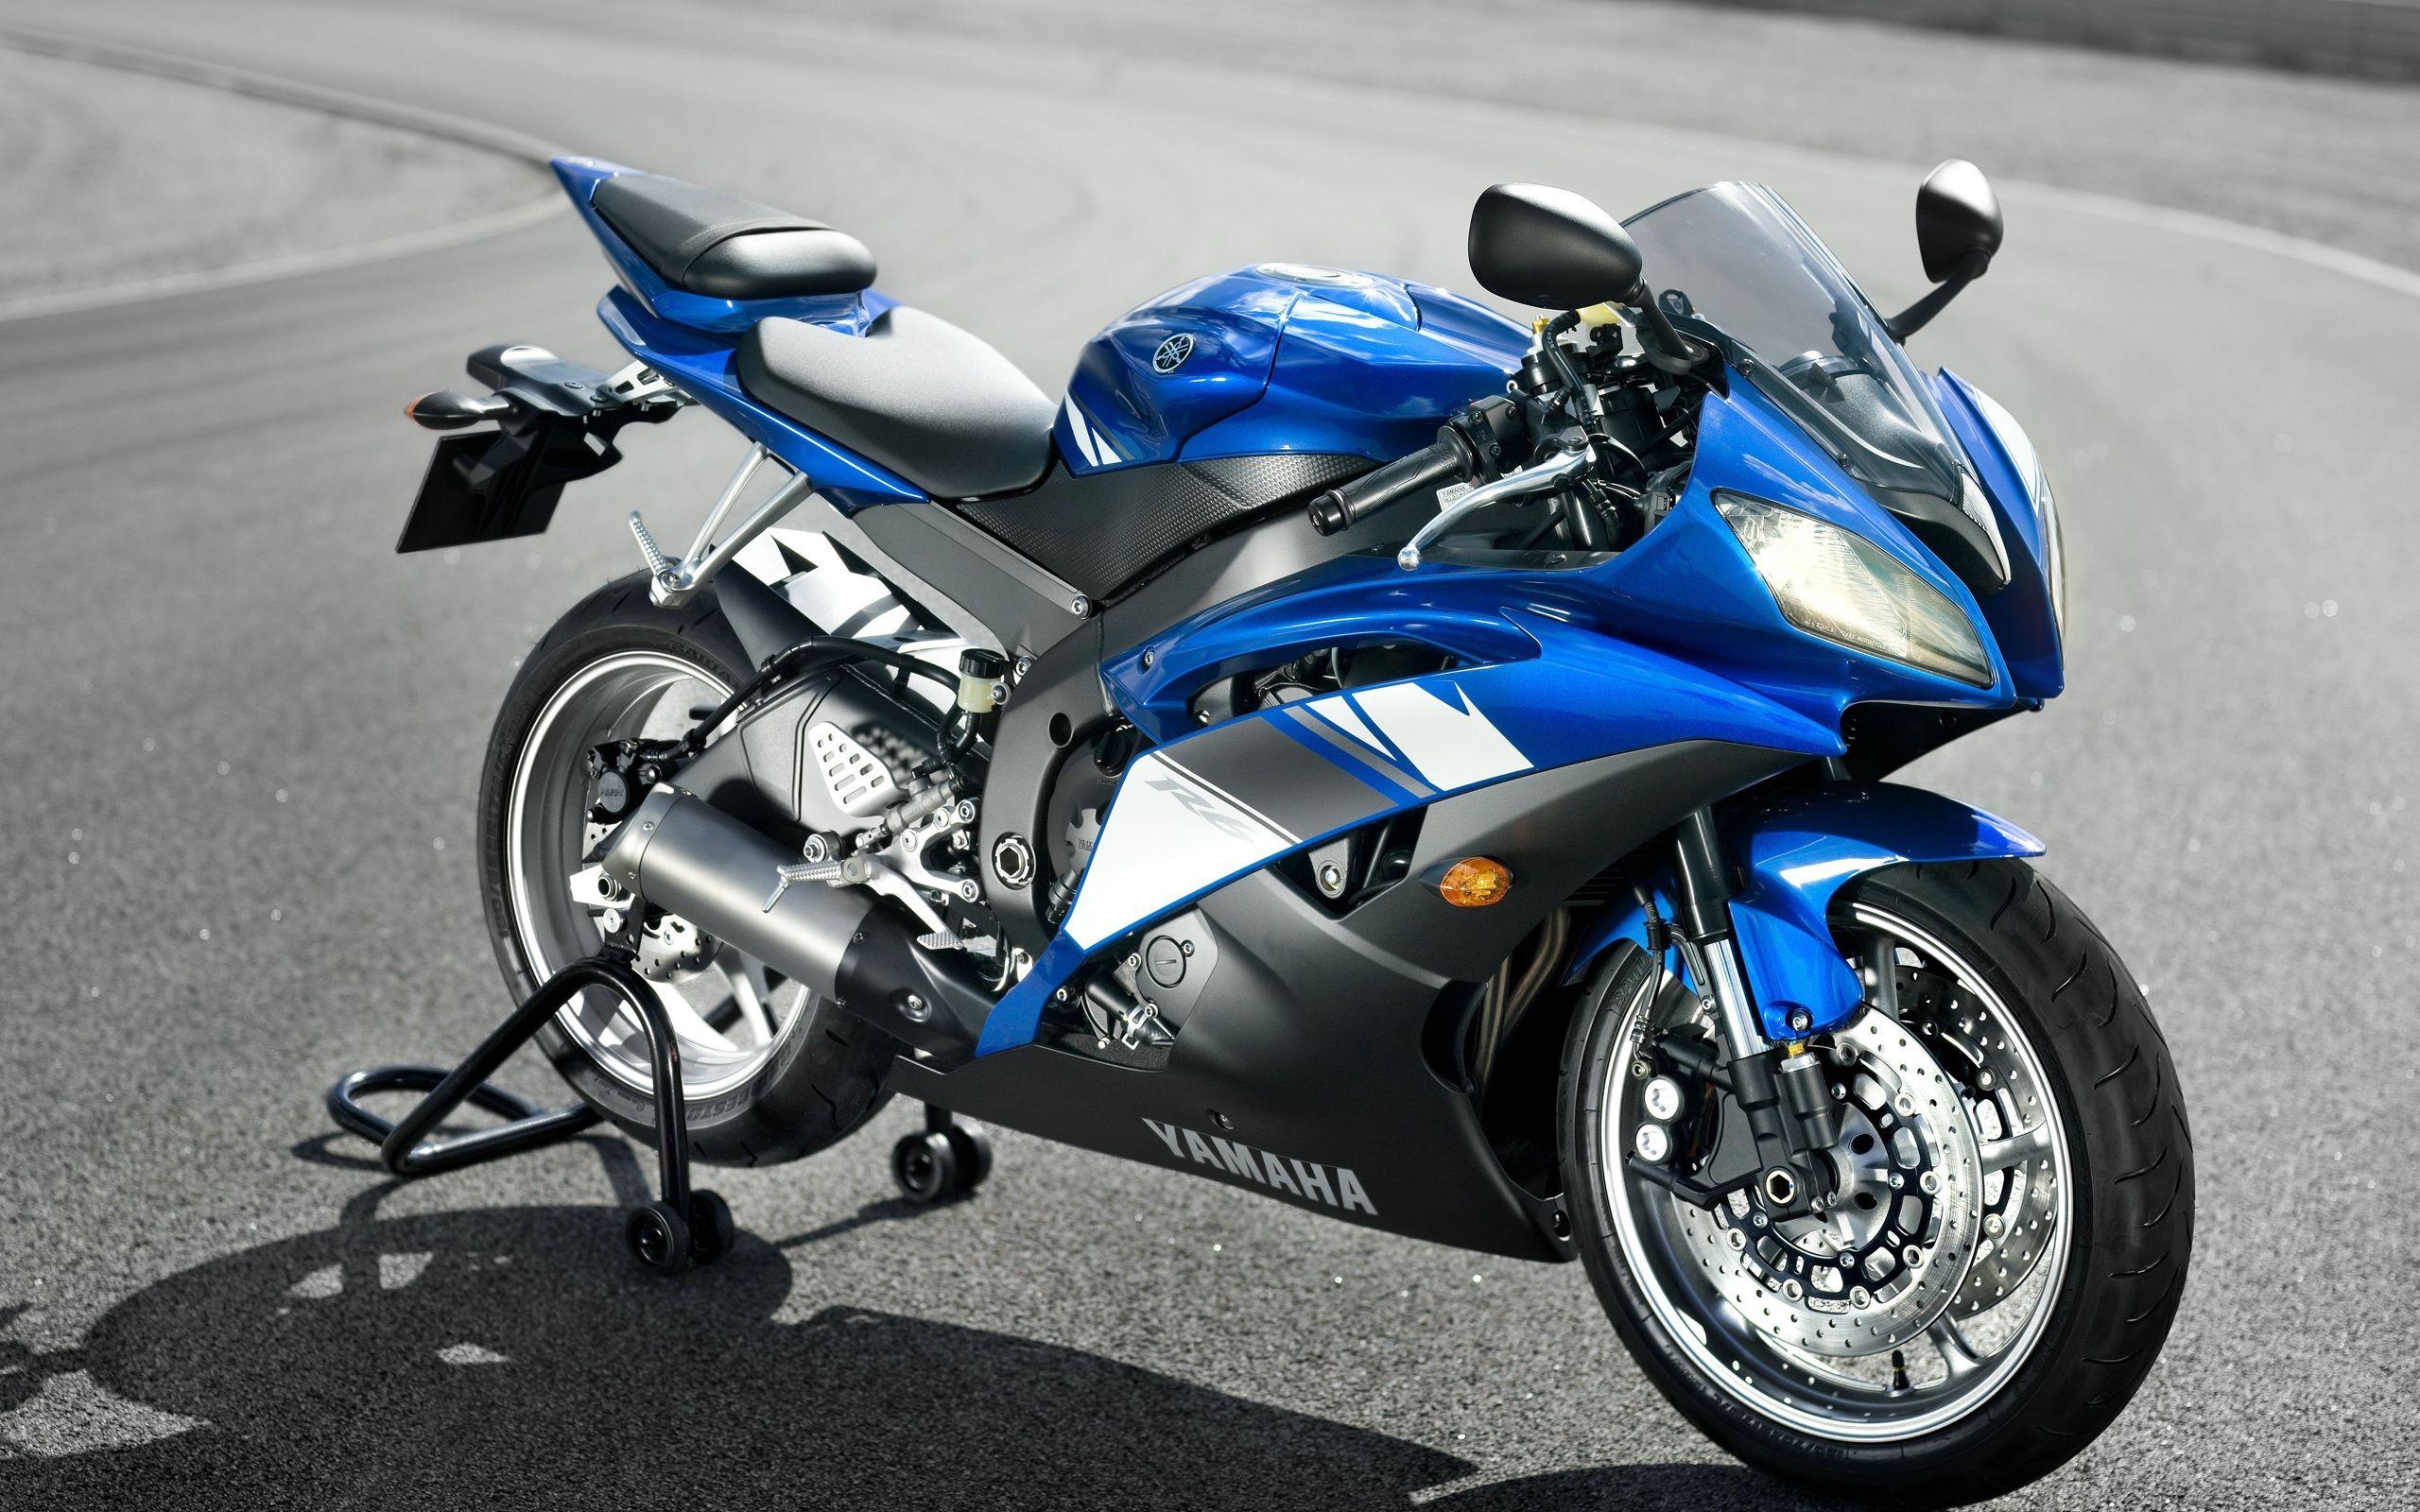 Yamaha Motorcycles Yzf R6 Yamaha Motorcycle Yzf R6 Wallpapers